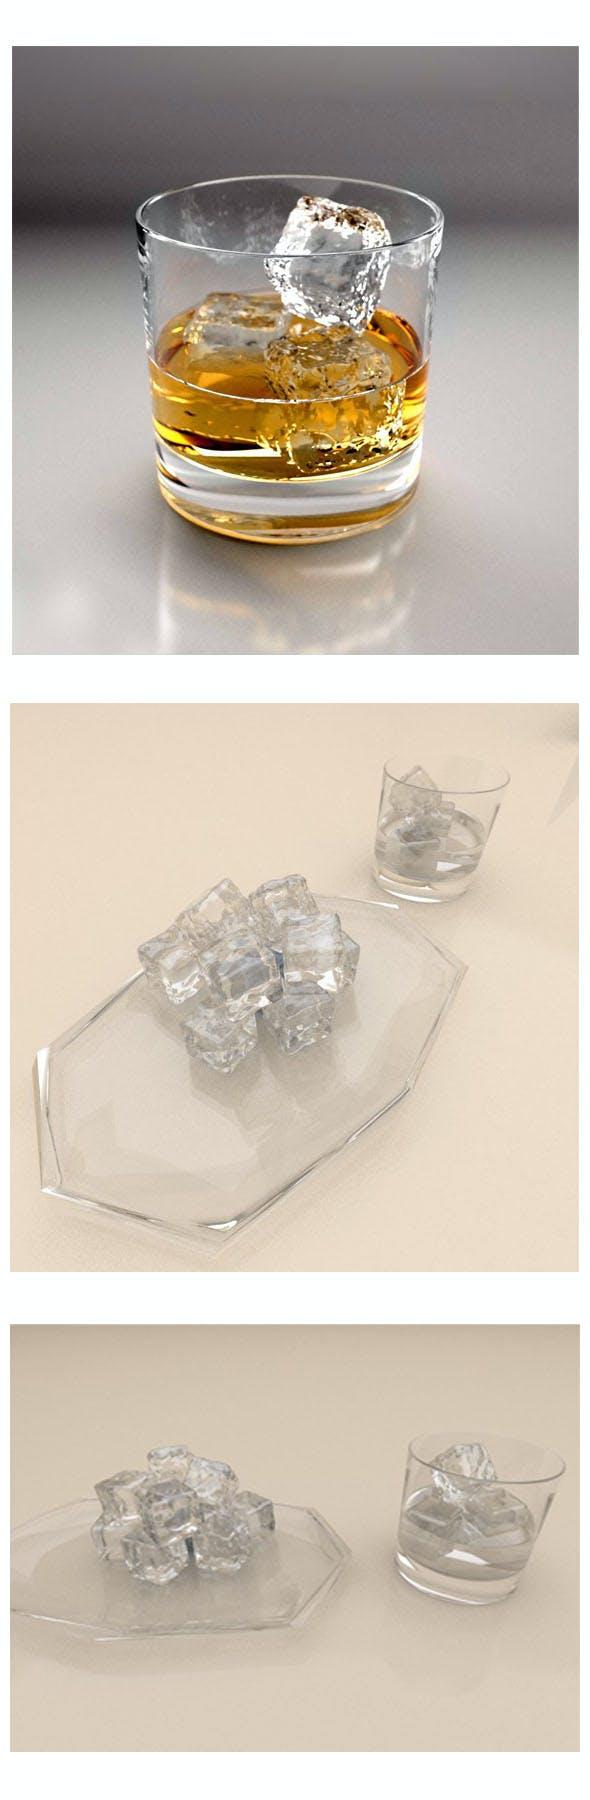 Glass tea cup - 3DOcean Item for Sale